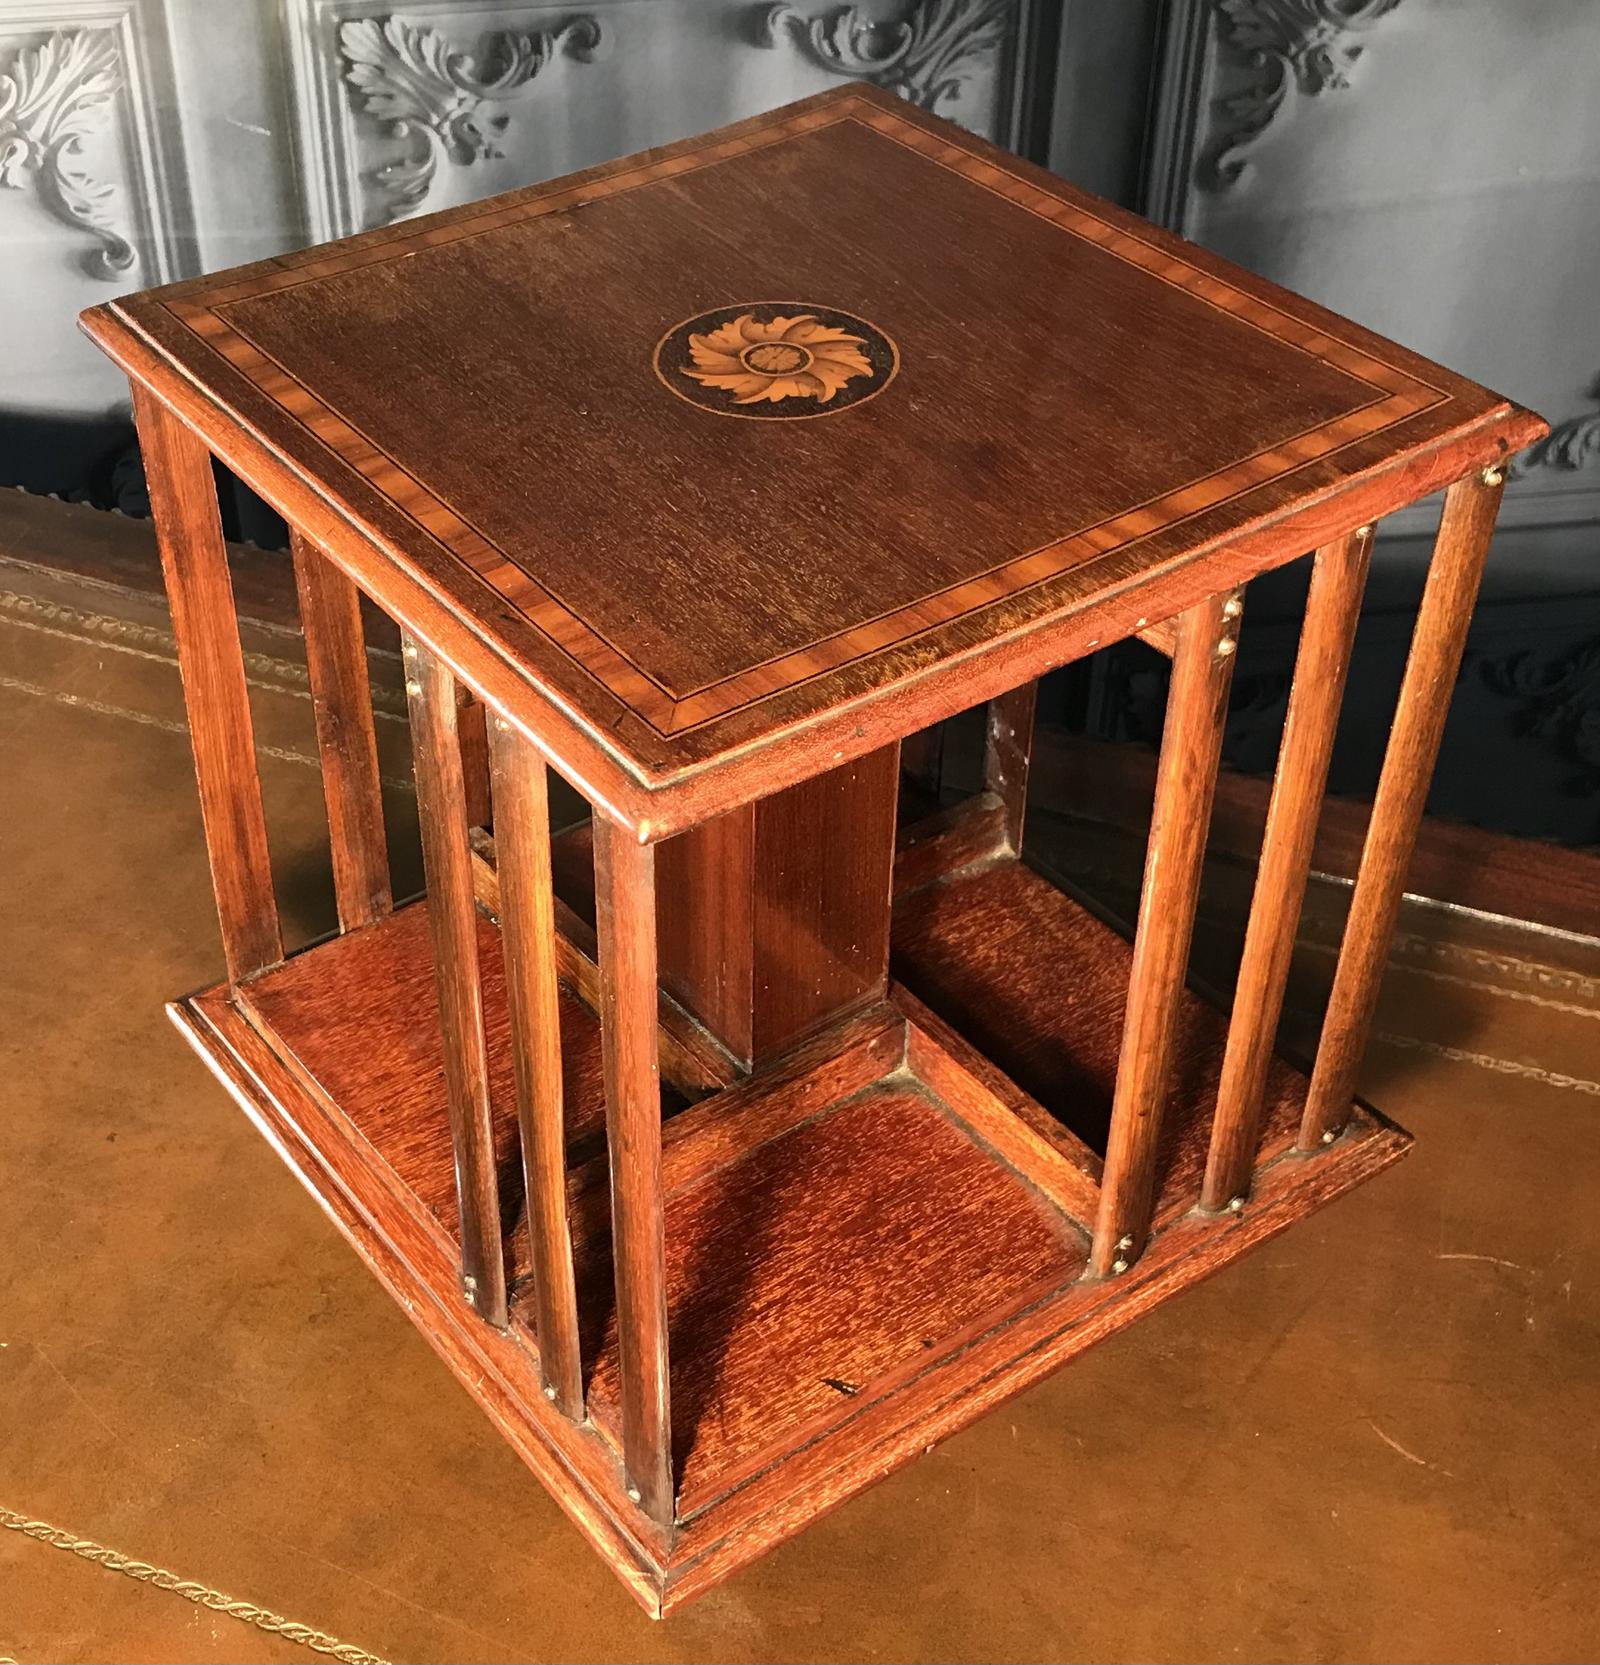 Edwardian Inlaid Mahogany Desk Top Revolving Bookcase (1 of 1)